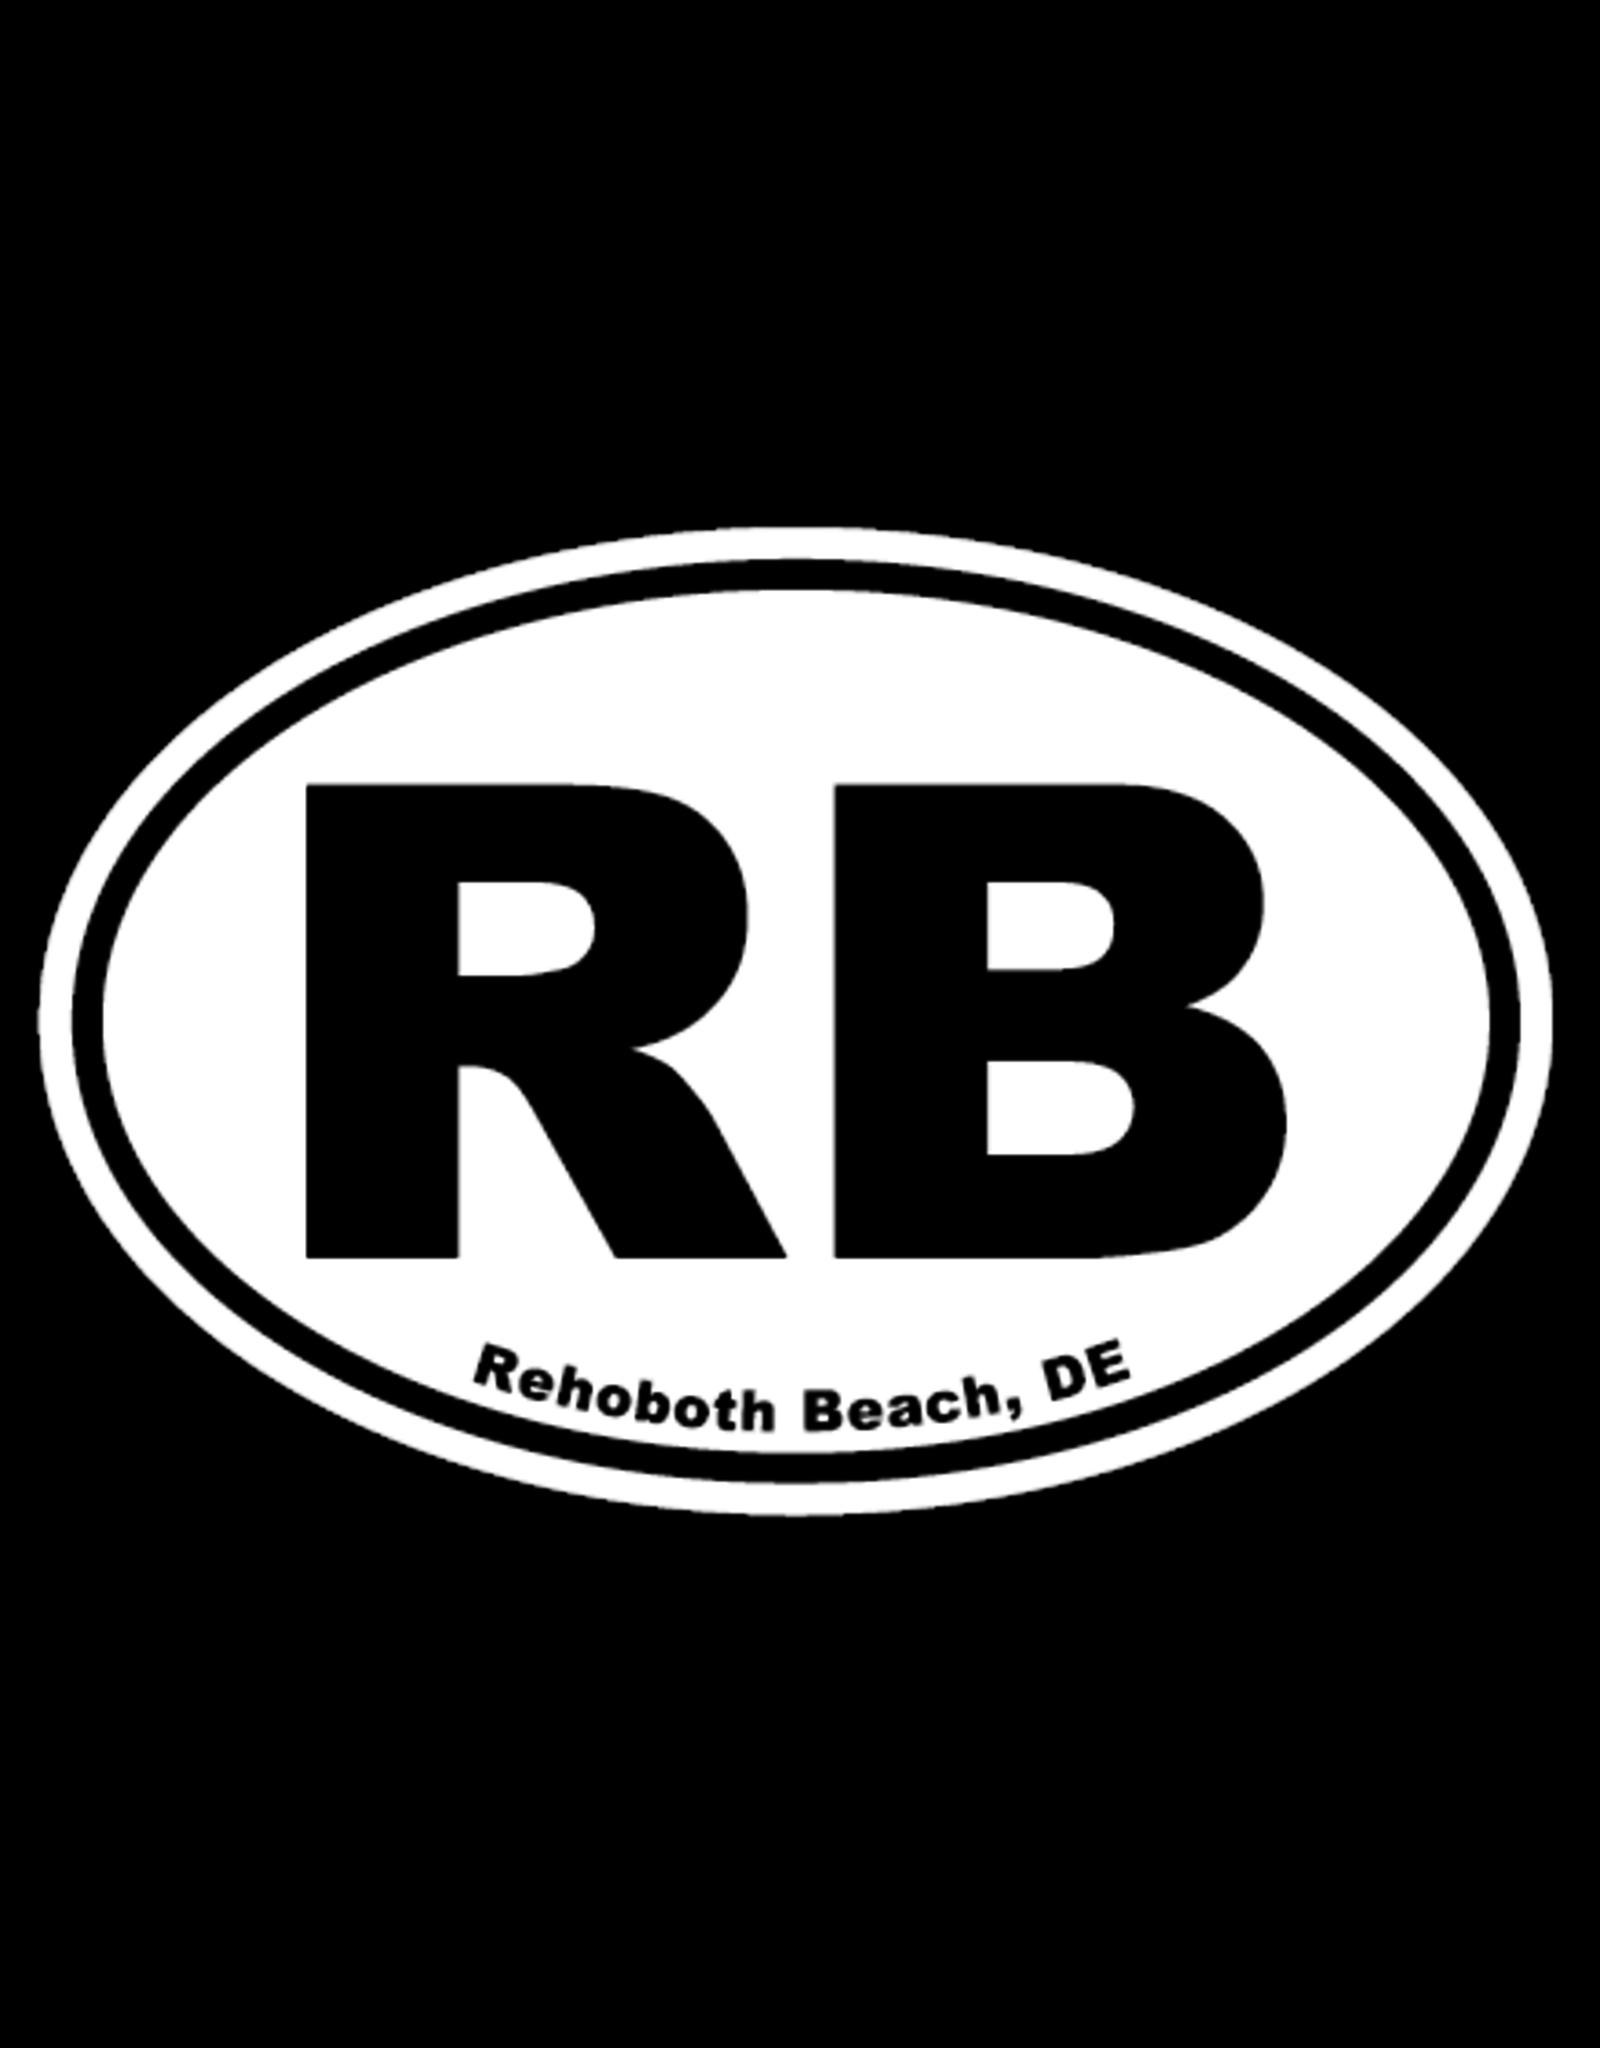 REHOBOTH LIFESTYLE EURO STICKER 5.75 x 3.875 OVAL REHOBOTH BEACH